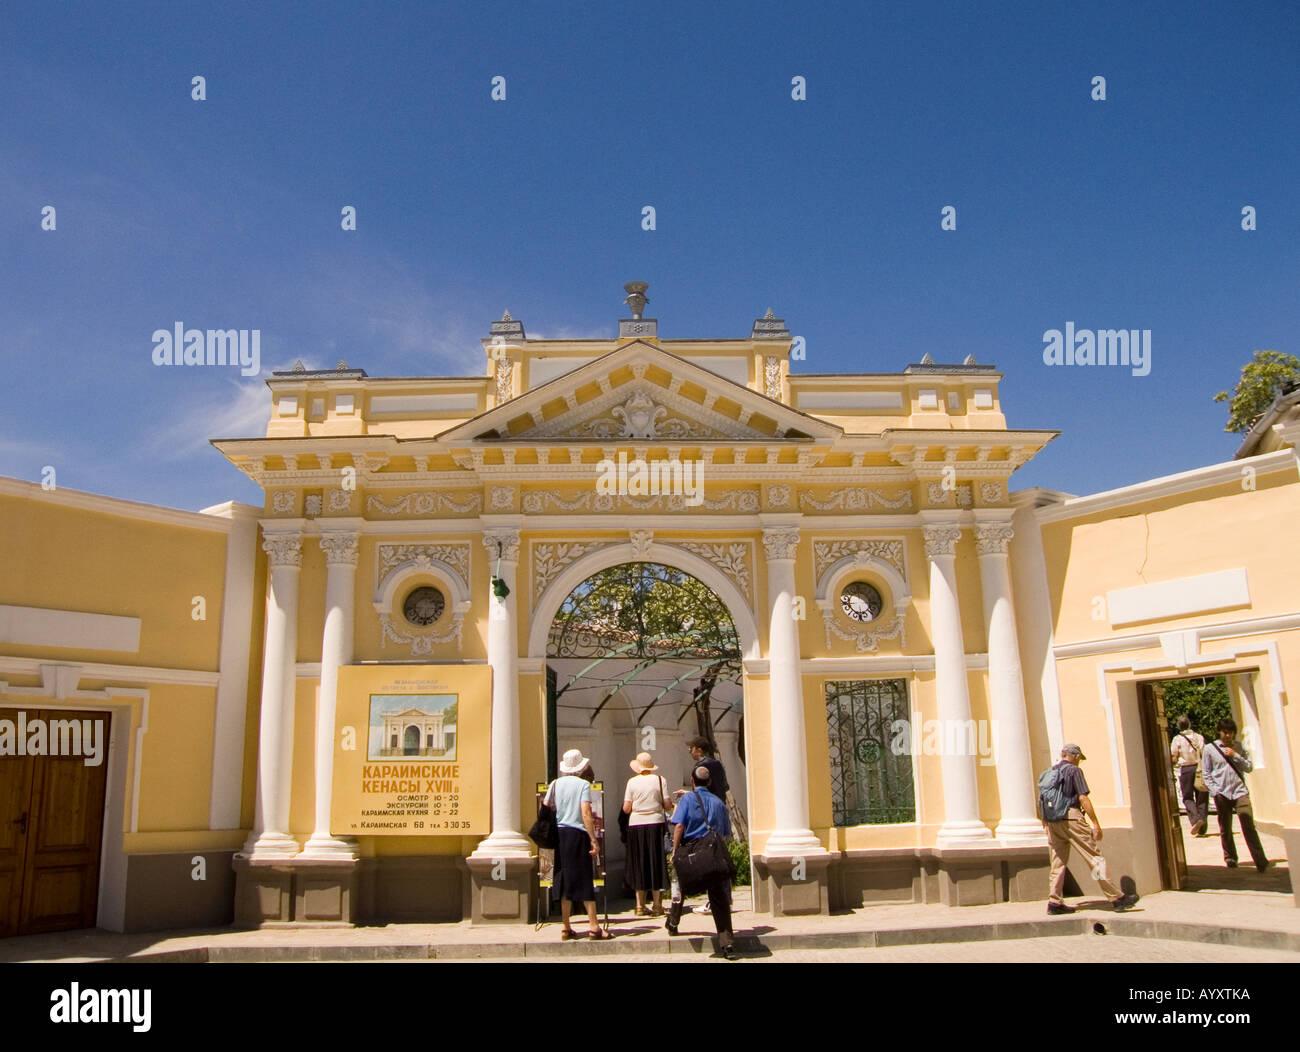 ukraine crimea yevpatoriya exterior of karaite synagogue - Stock Image